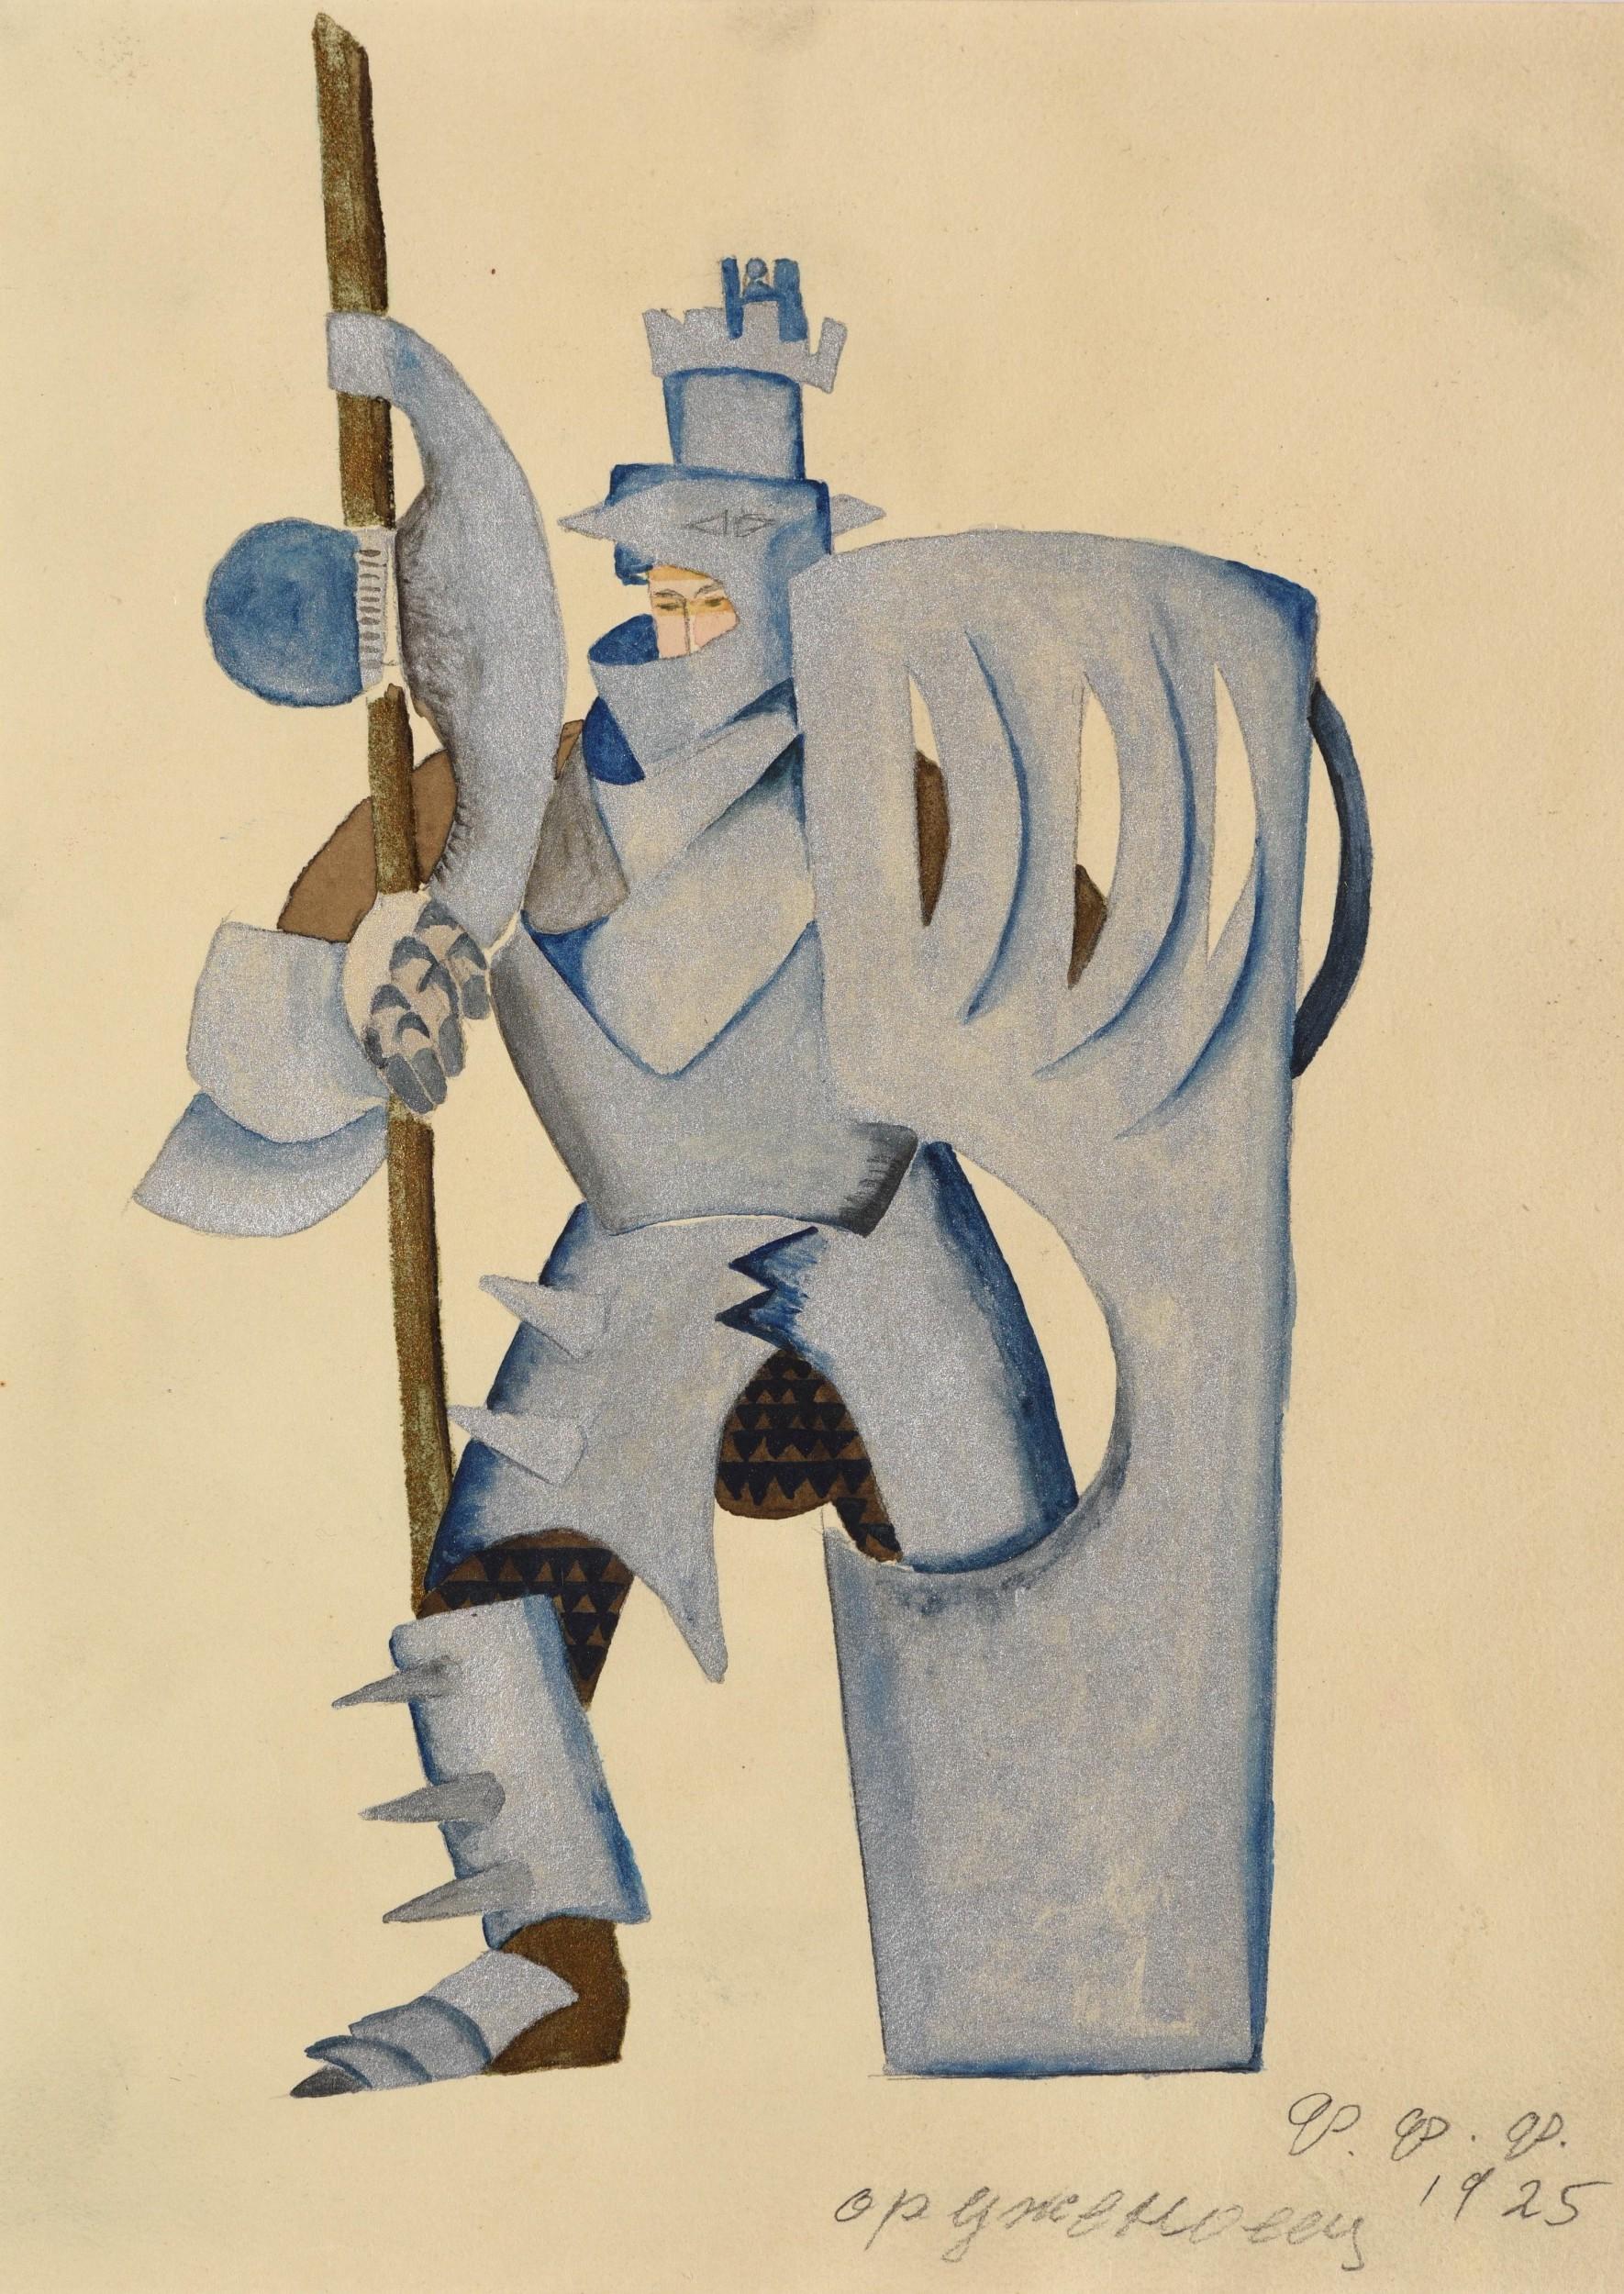 Feodor Feodorovitch Fedorovski, esquisse pour un costume de «Lohengrin», 1925, image ©HVMC